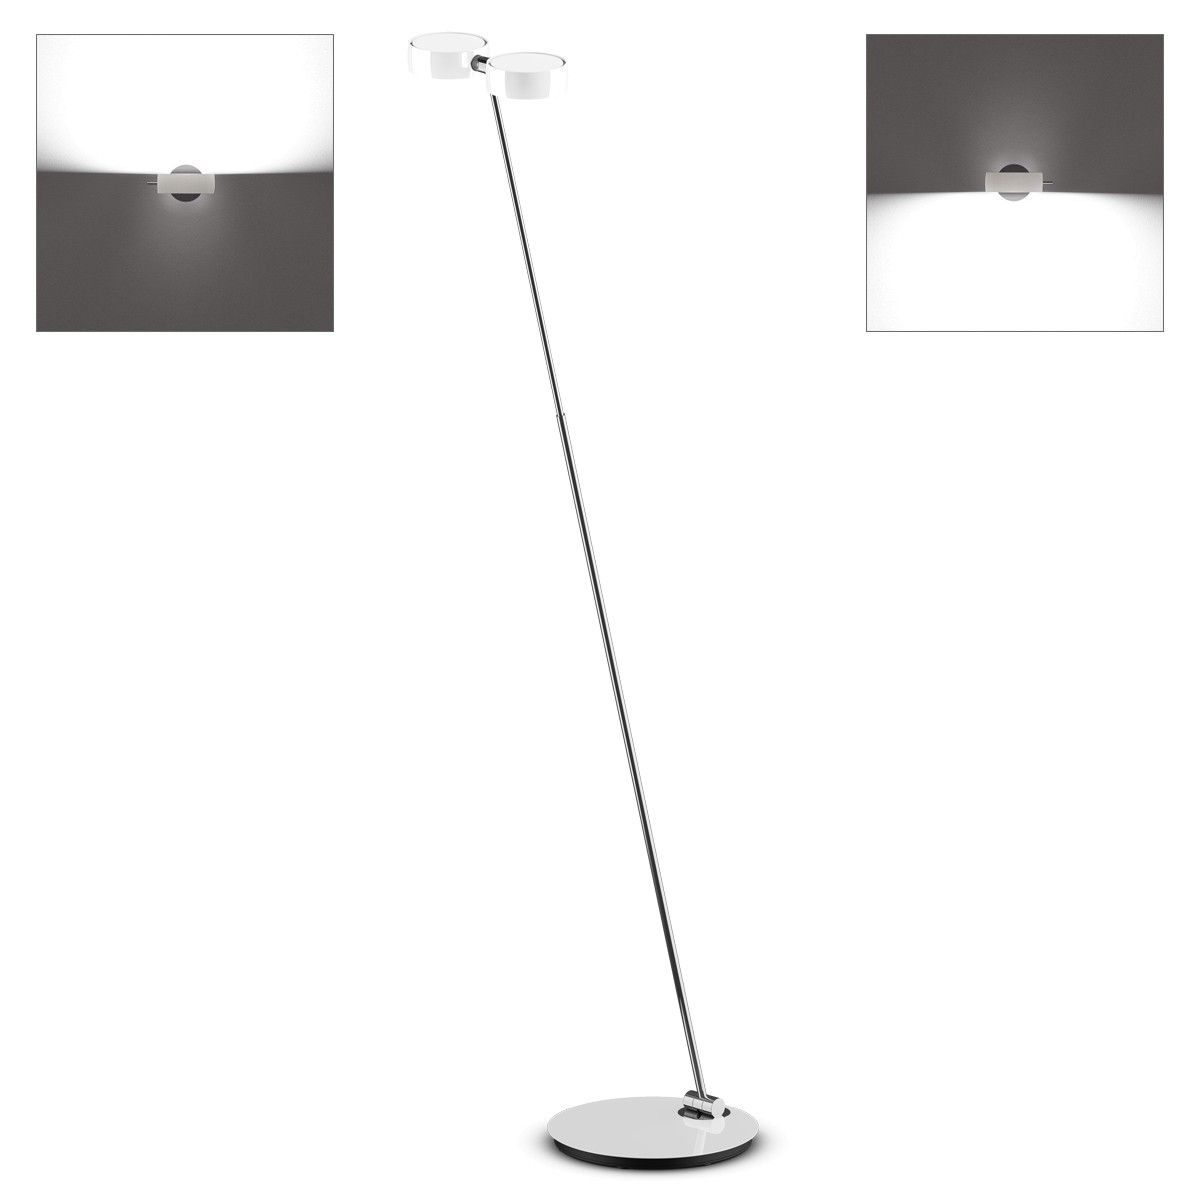 Occhio Sento B LED terra Stehleuchte, 2700 K, Chrom / weiß glänzend